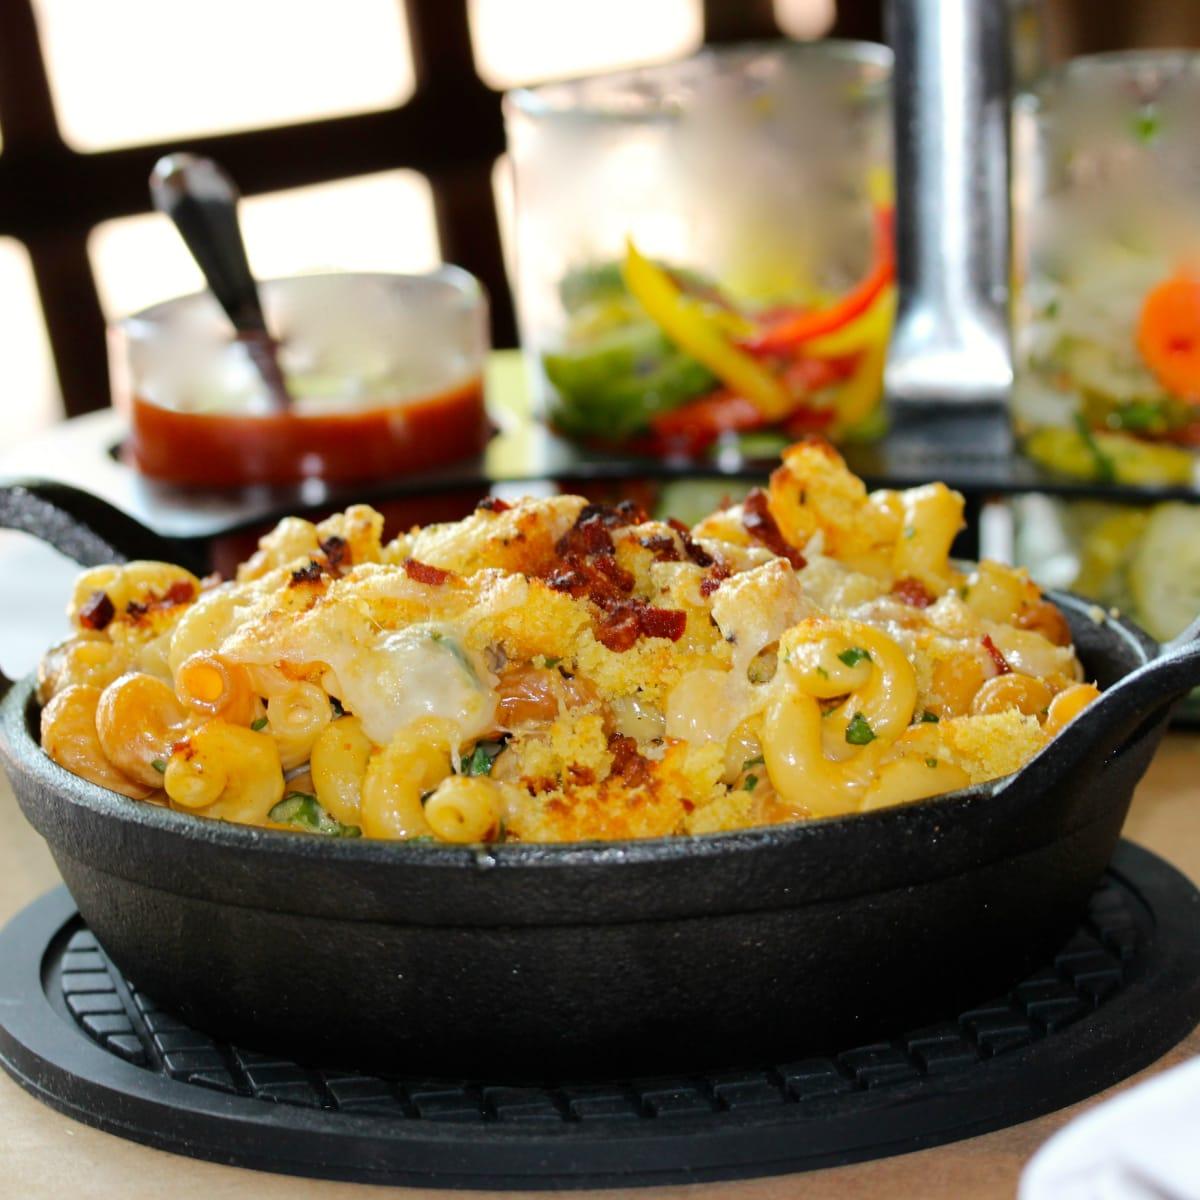 Hickory Plano restaurant mac and cheese 2015